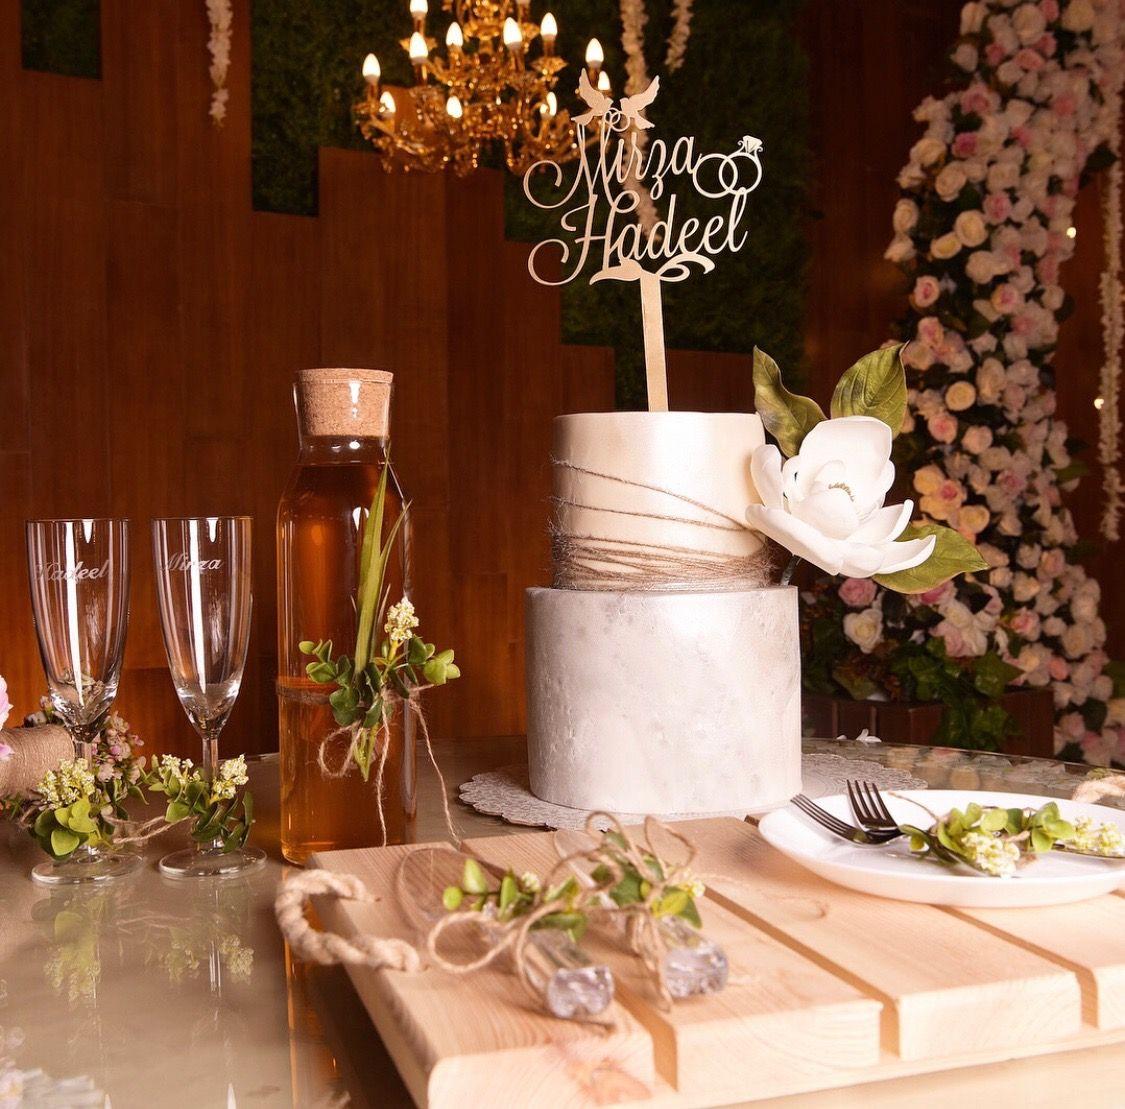 Wedding Glass طقم كاسات الزواج طقم الكيك Infintememoeies Table Decorations Decor Home Decor